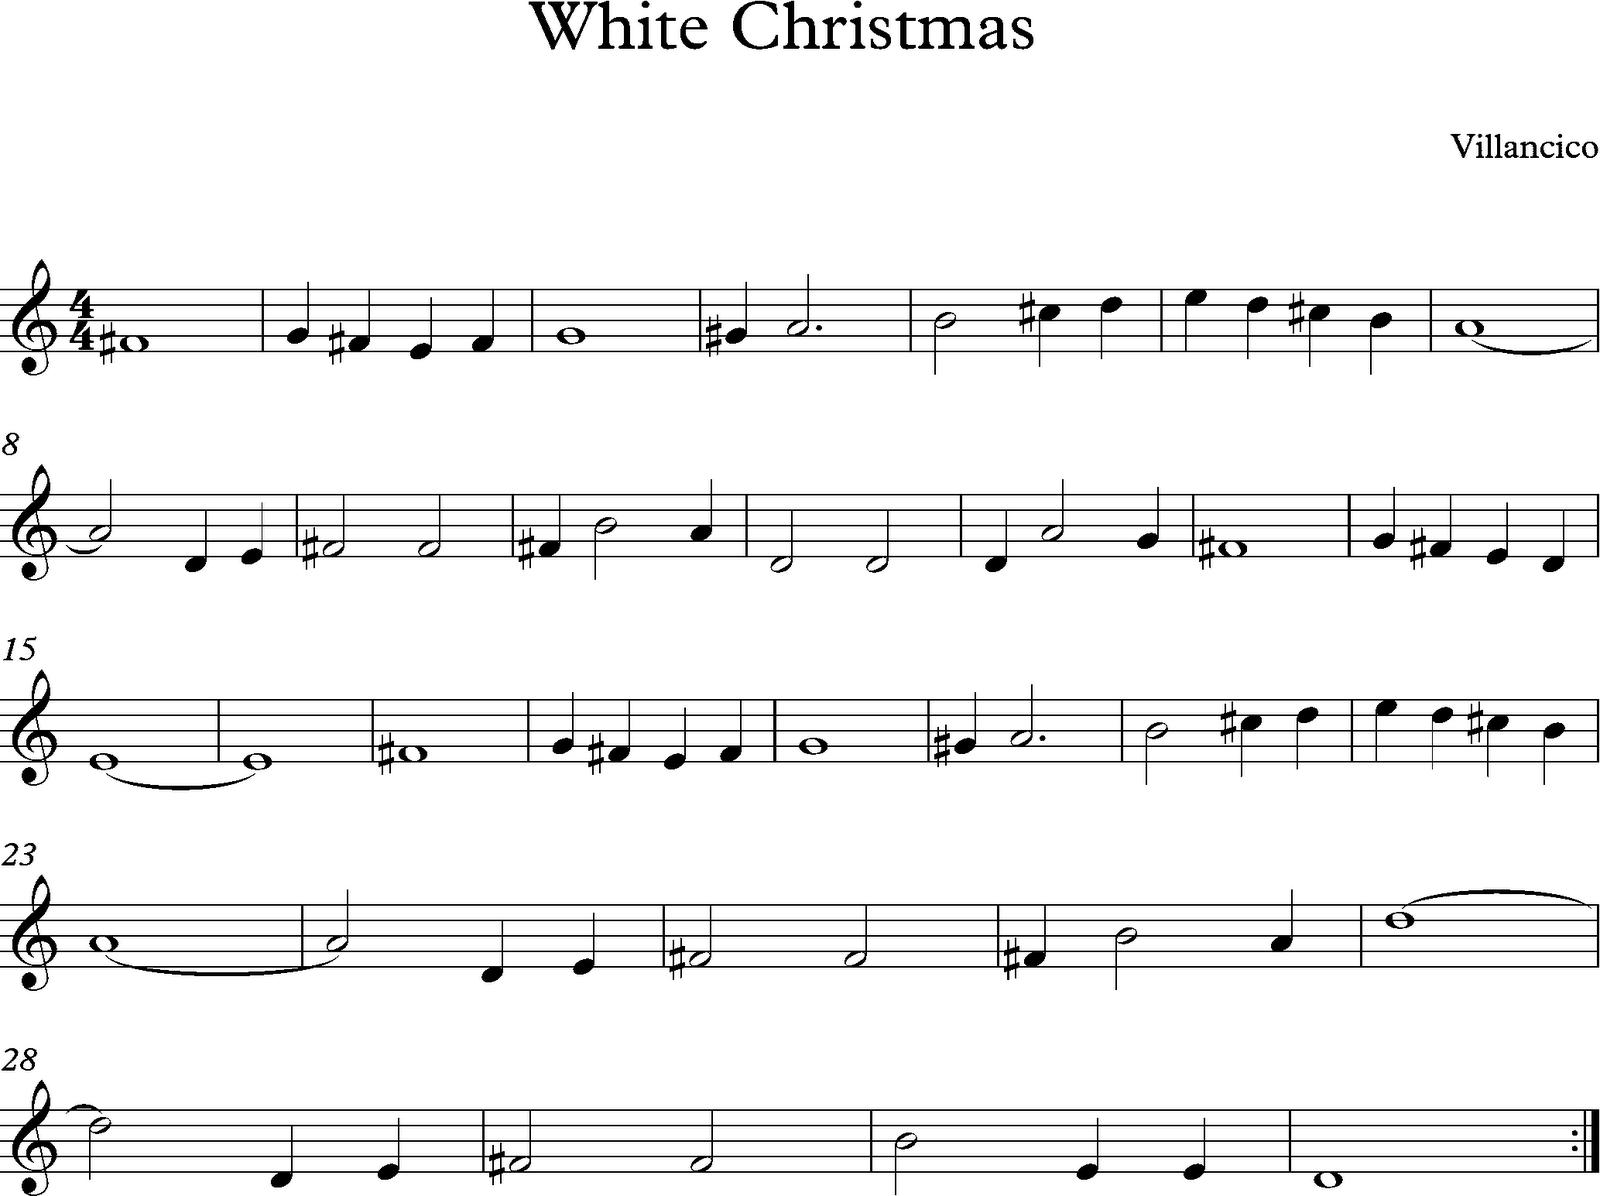 descubriendo la musica partituras para flauta dulce o de pico white christmas flauta dulce o de pico white christmas